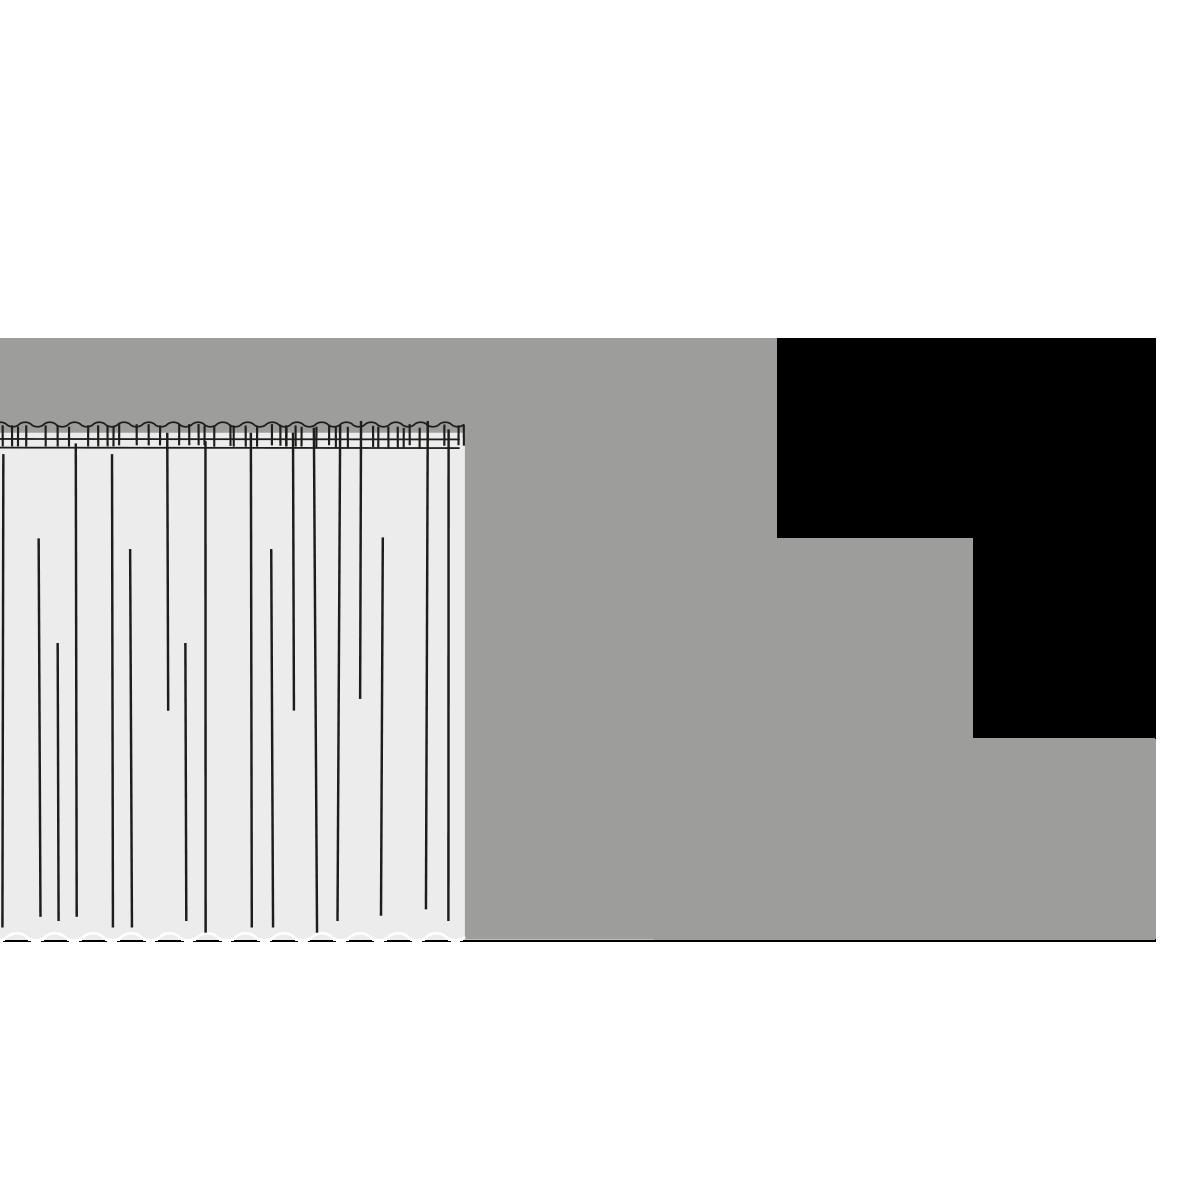 Bühne/Podest 2,5 x 2,5 m